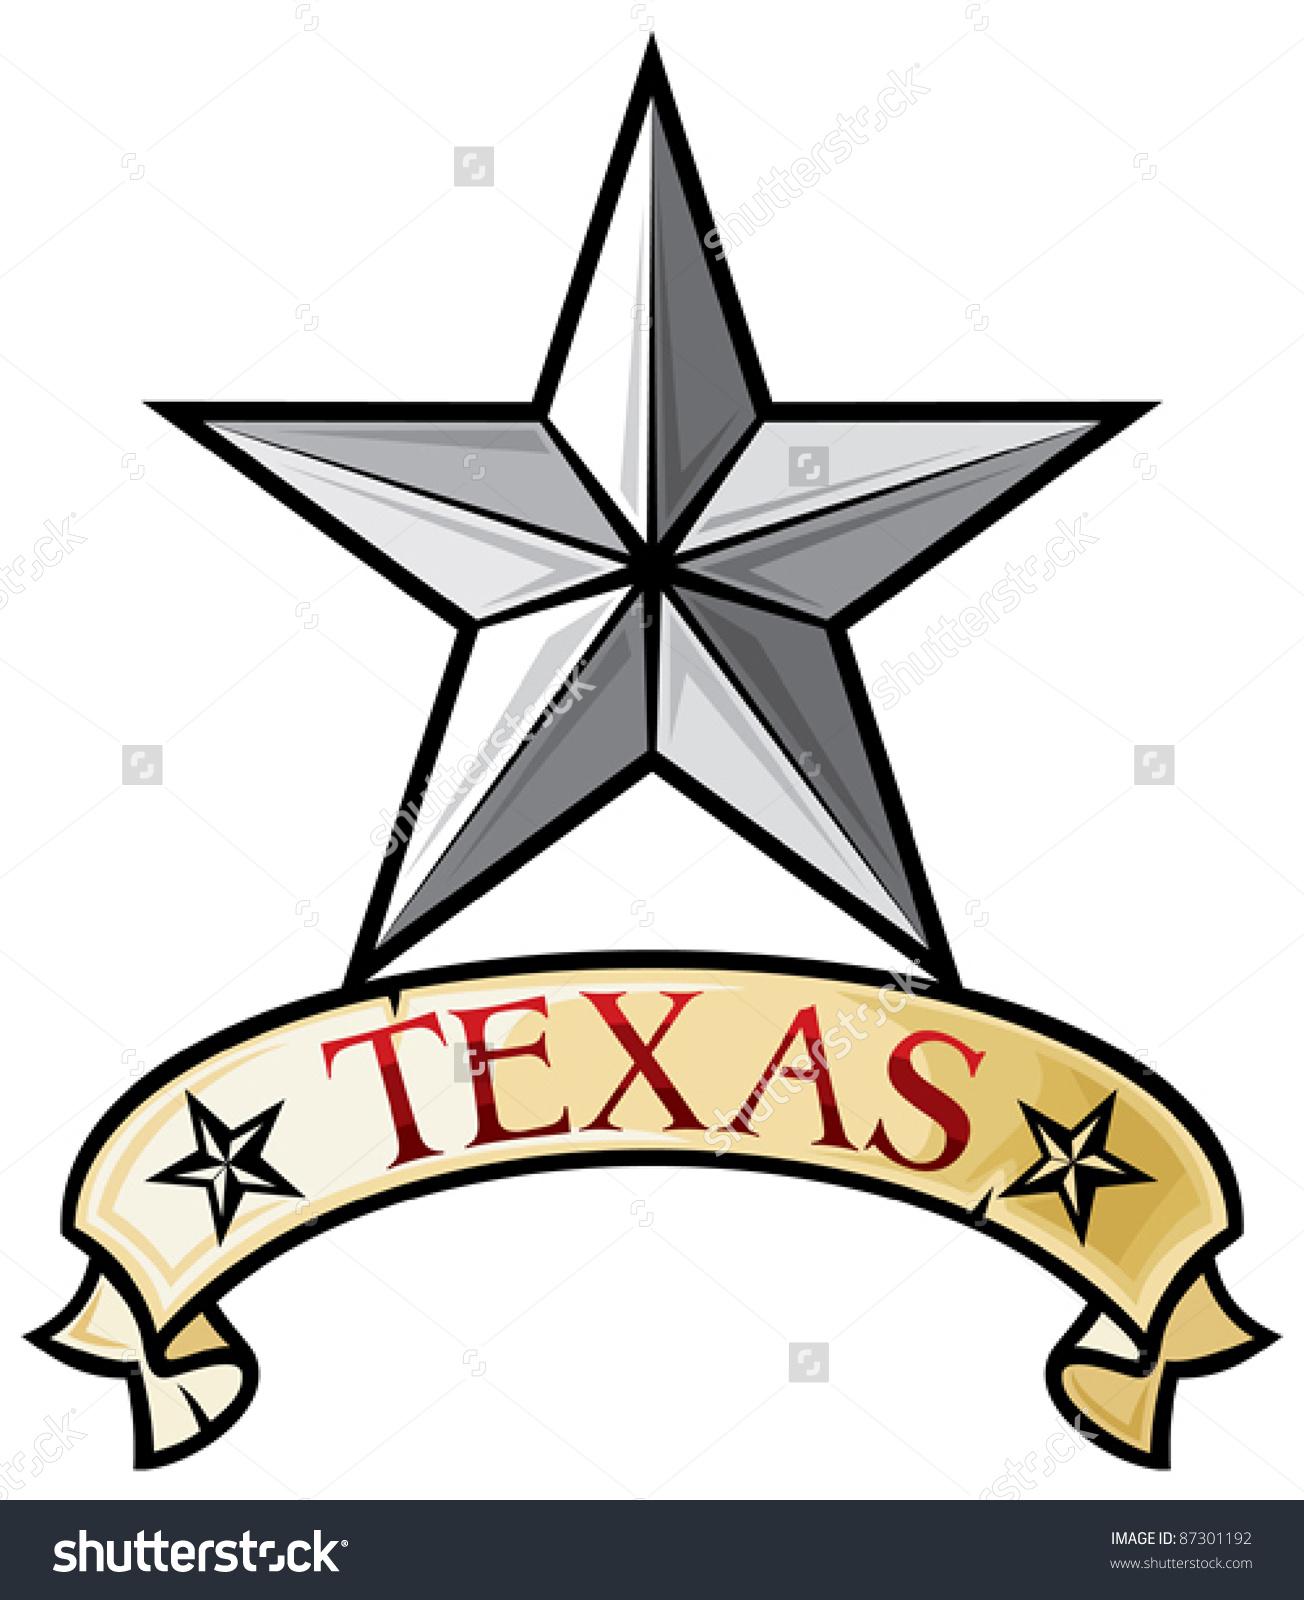 Similiar Texas Lone Star Clip Art Keywords.